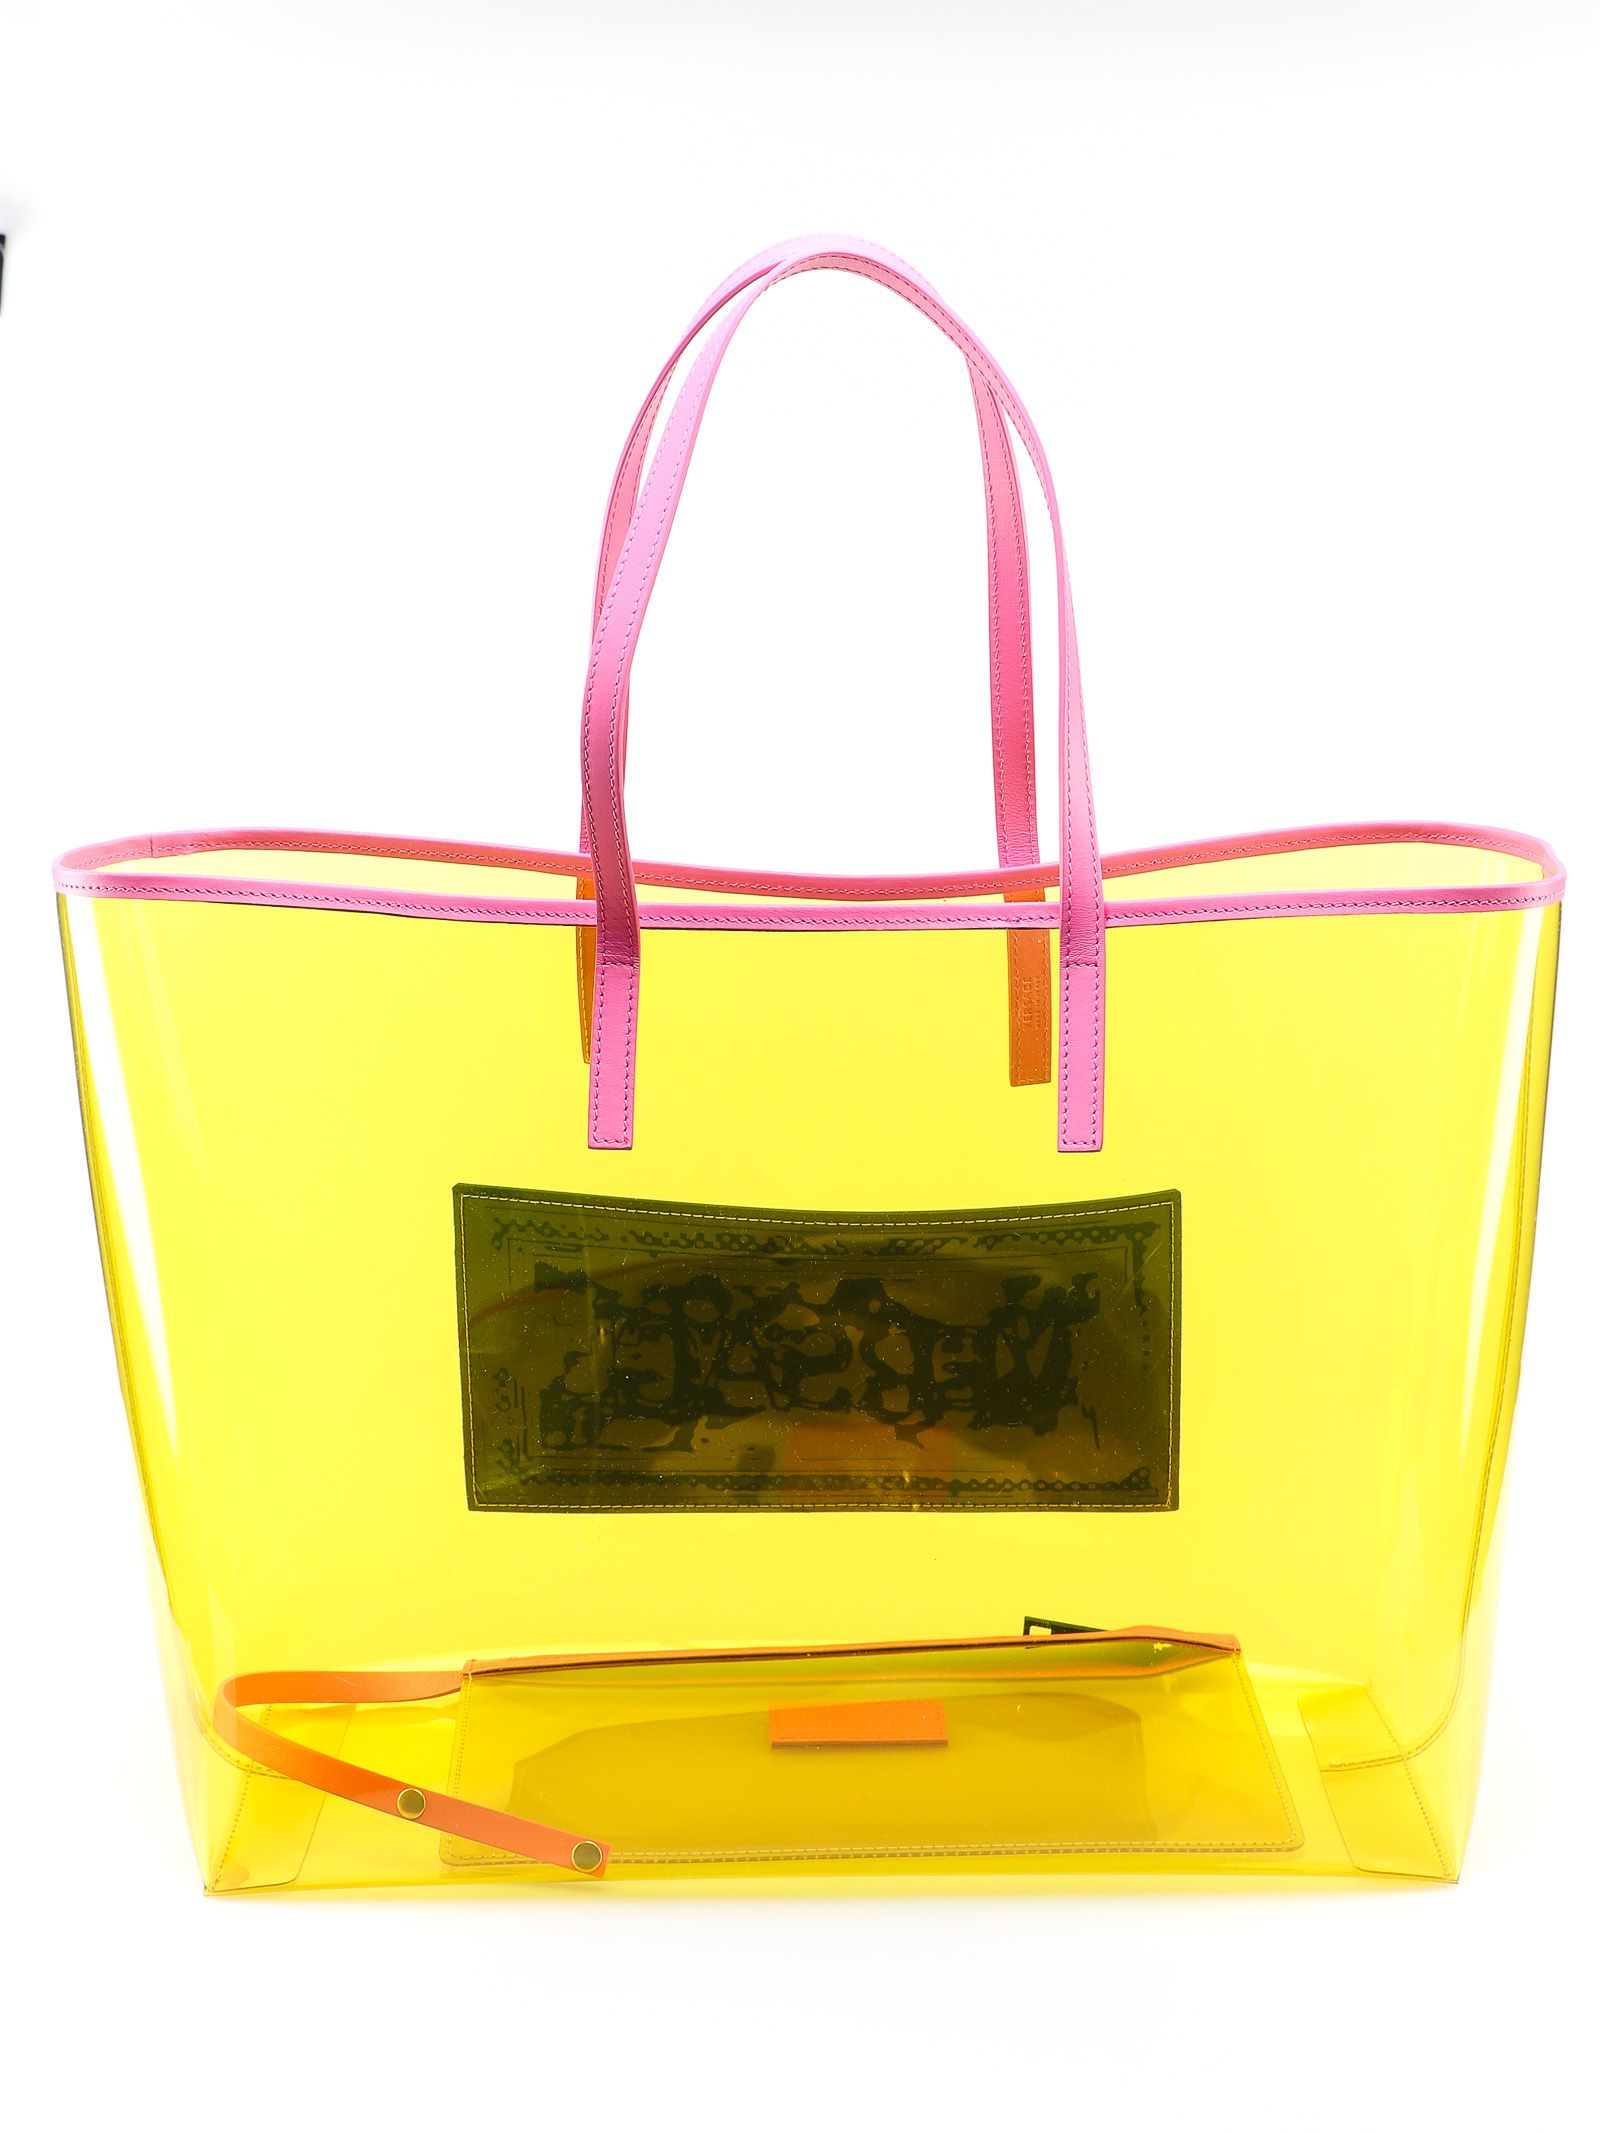 0272a62da1d3 Versace Versace Clear Vinyl Tote - Df2mt Giallo Fluo Multicolor ...